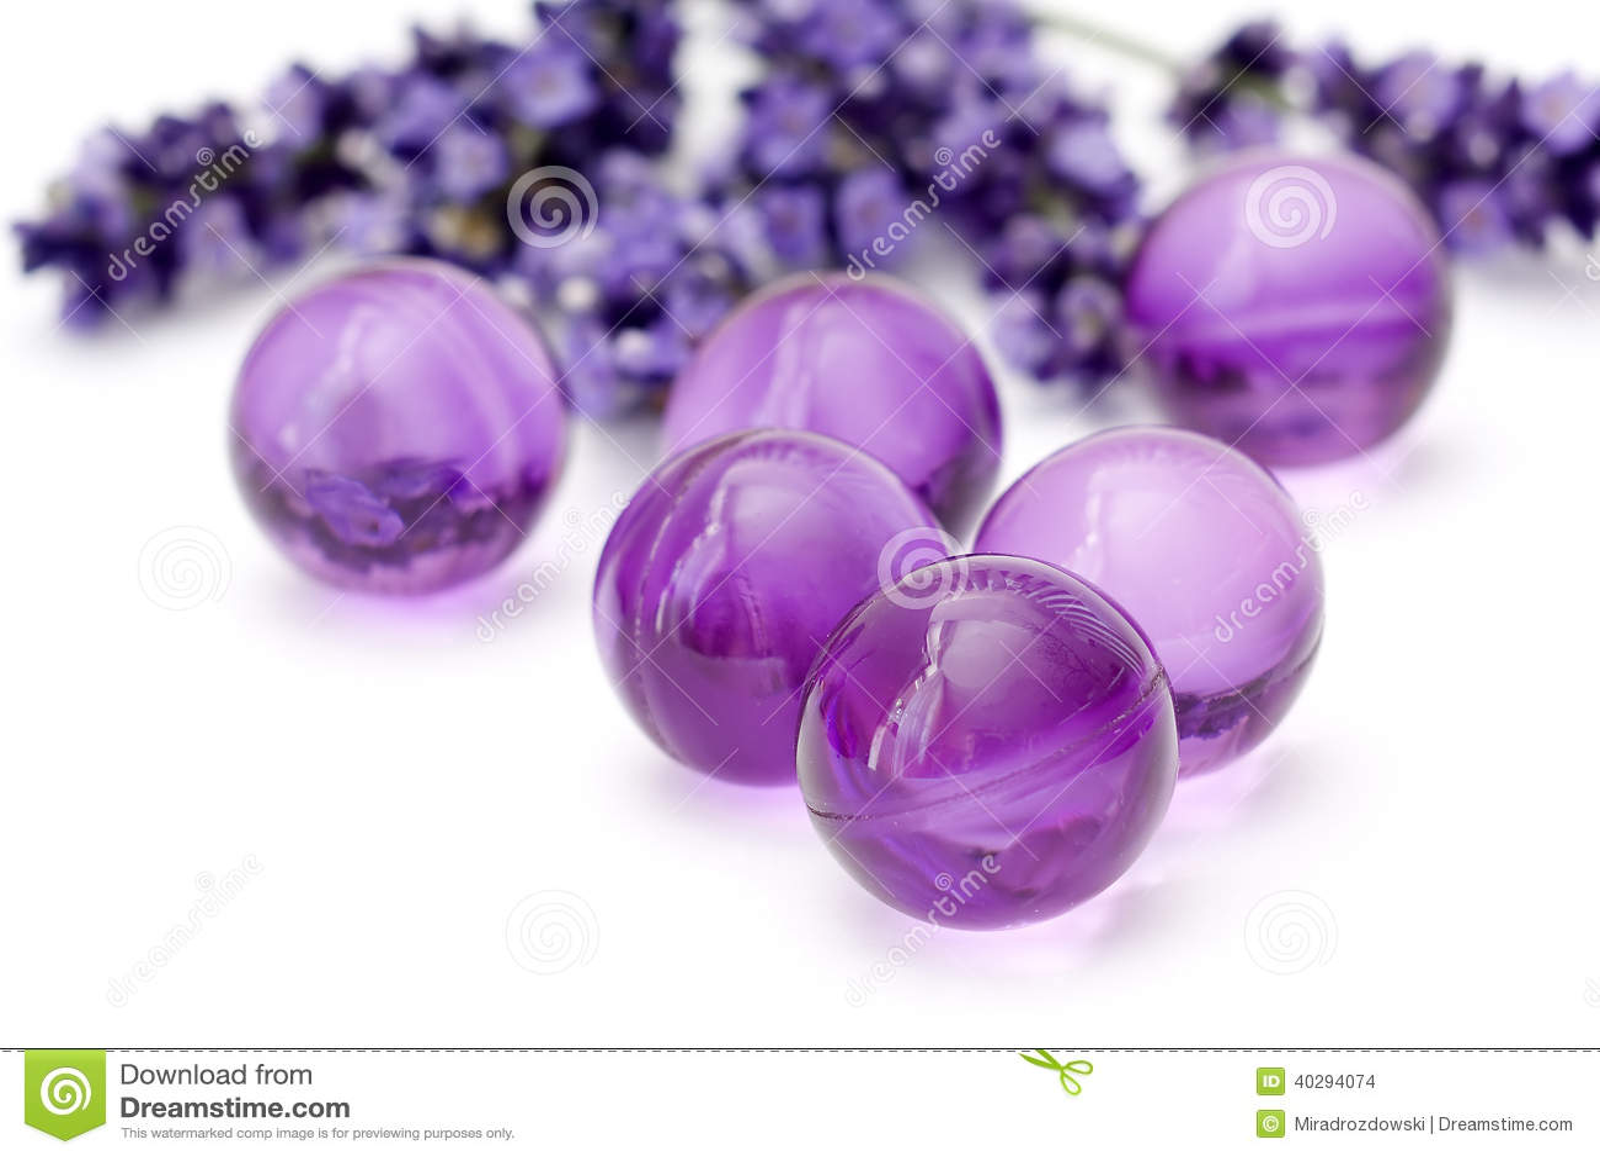 Oil bath pearls stock photo  Image of hygiene, renew - 40294074